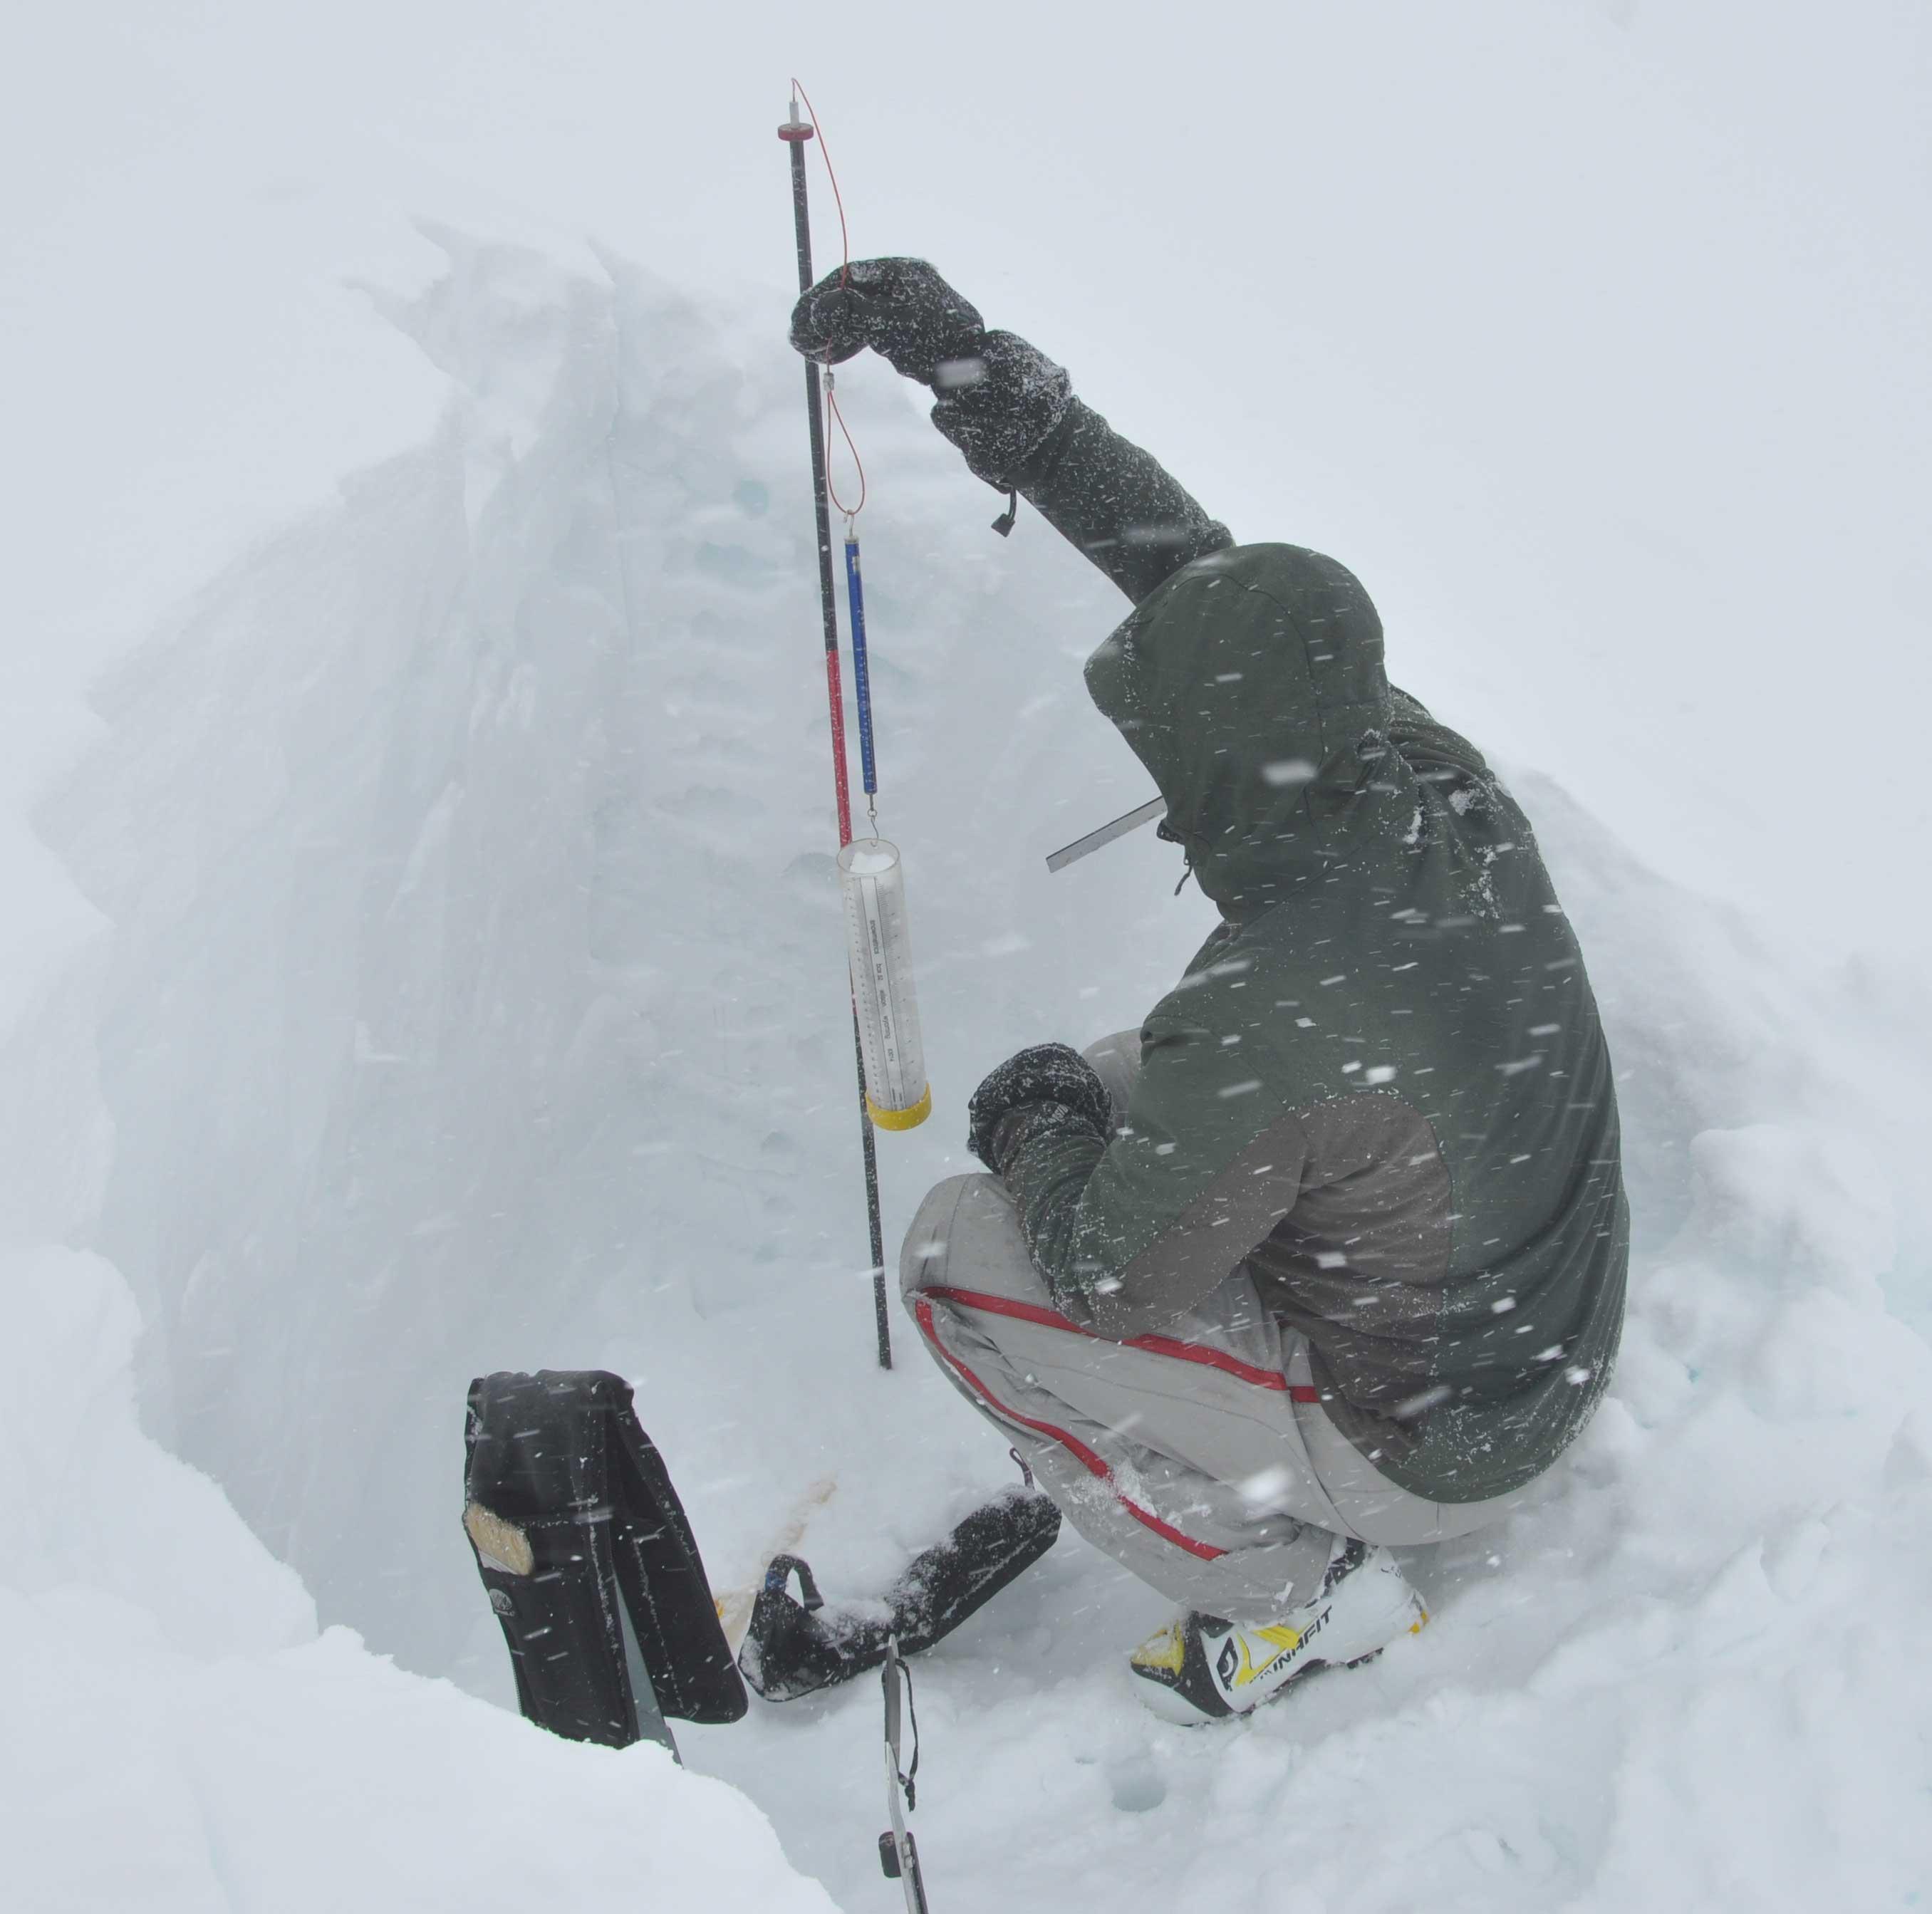 Build your own snowpit kit